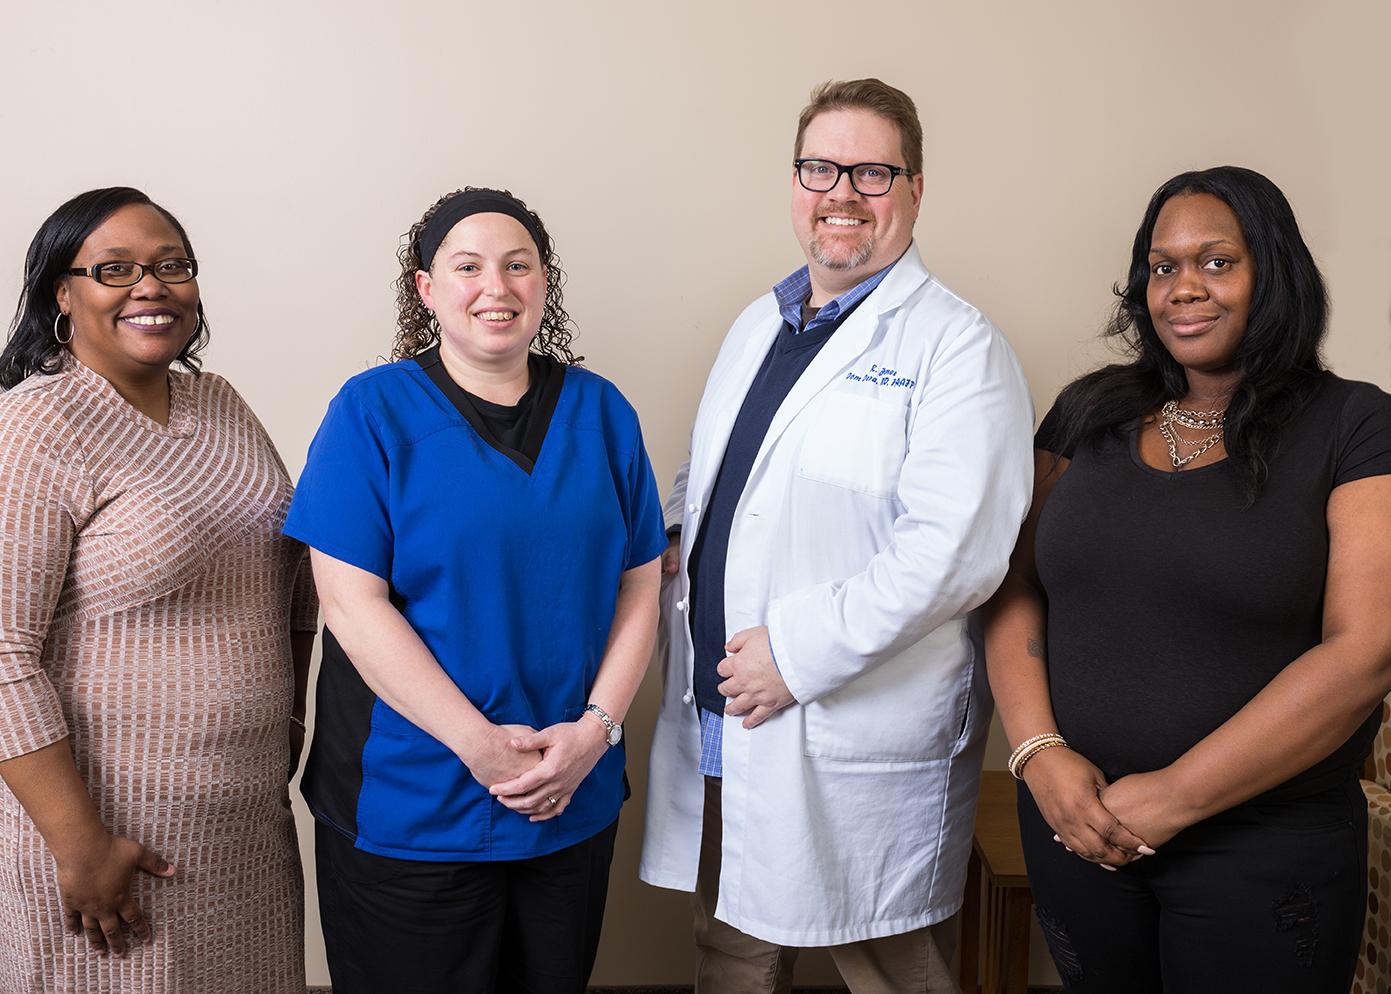 Kiecha Robinson, Allison Carte, Dr. James Dom Dera, and Sha'quanna Hooks